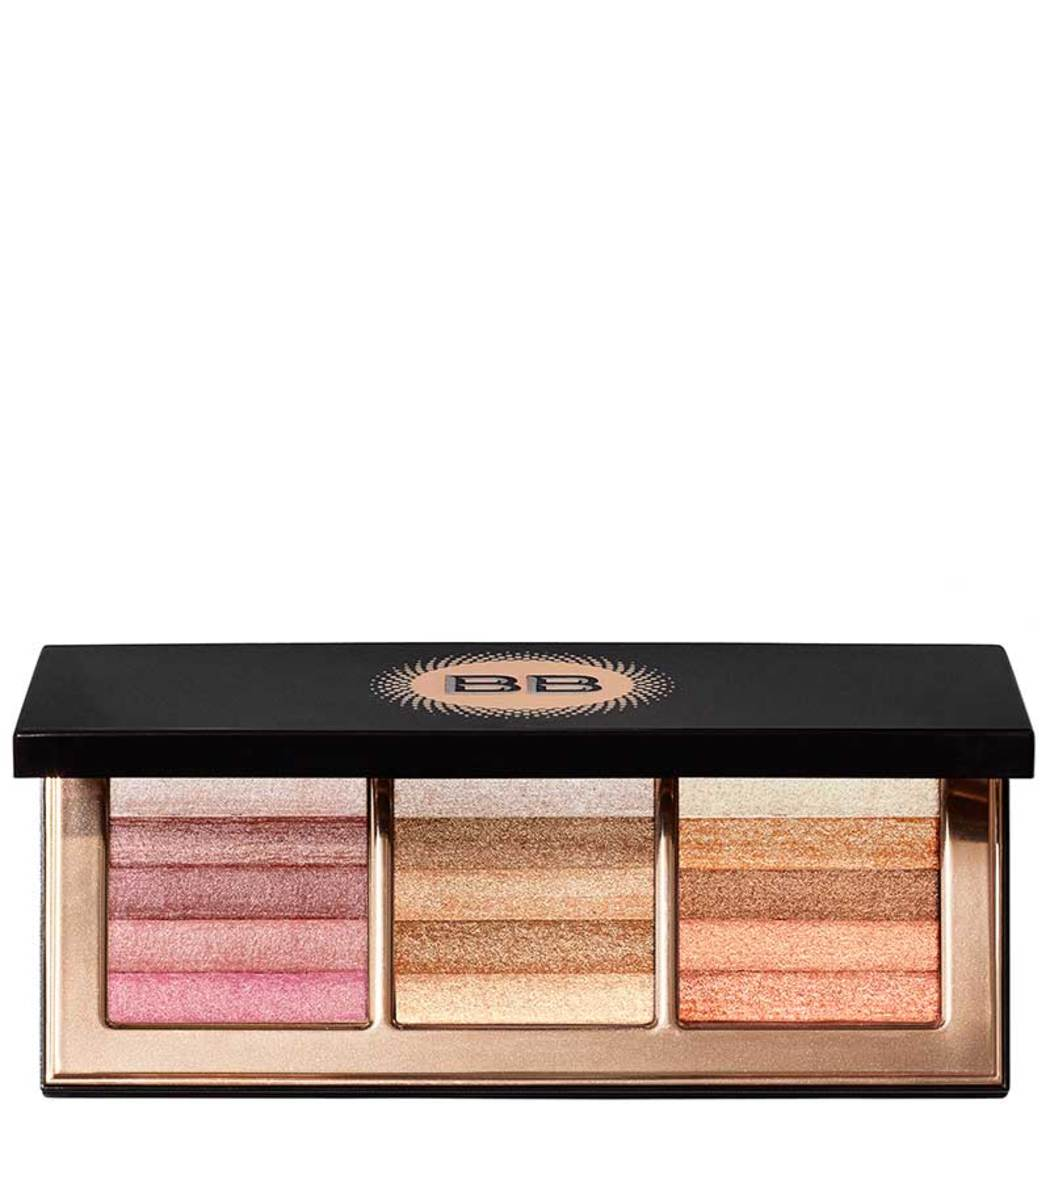 Bobbi Brown Highlight Glow Shimmer Brick Palette In Multi Modesens Illuminating Cheek Limited Edition